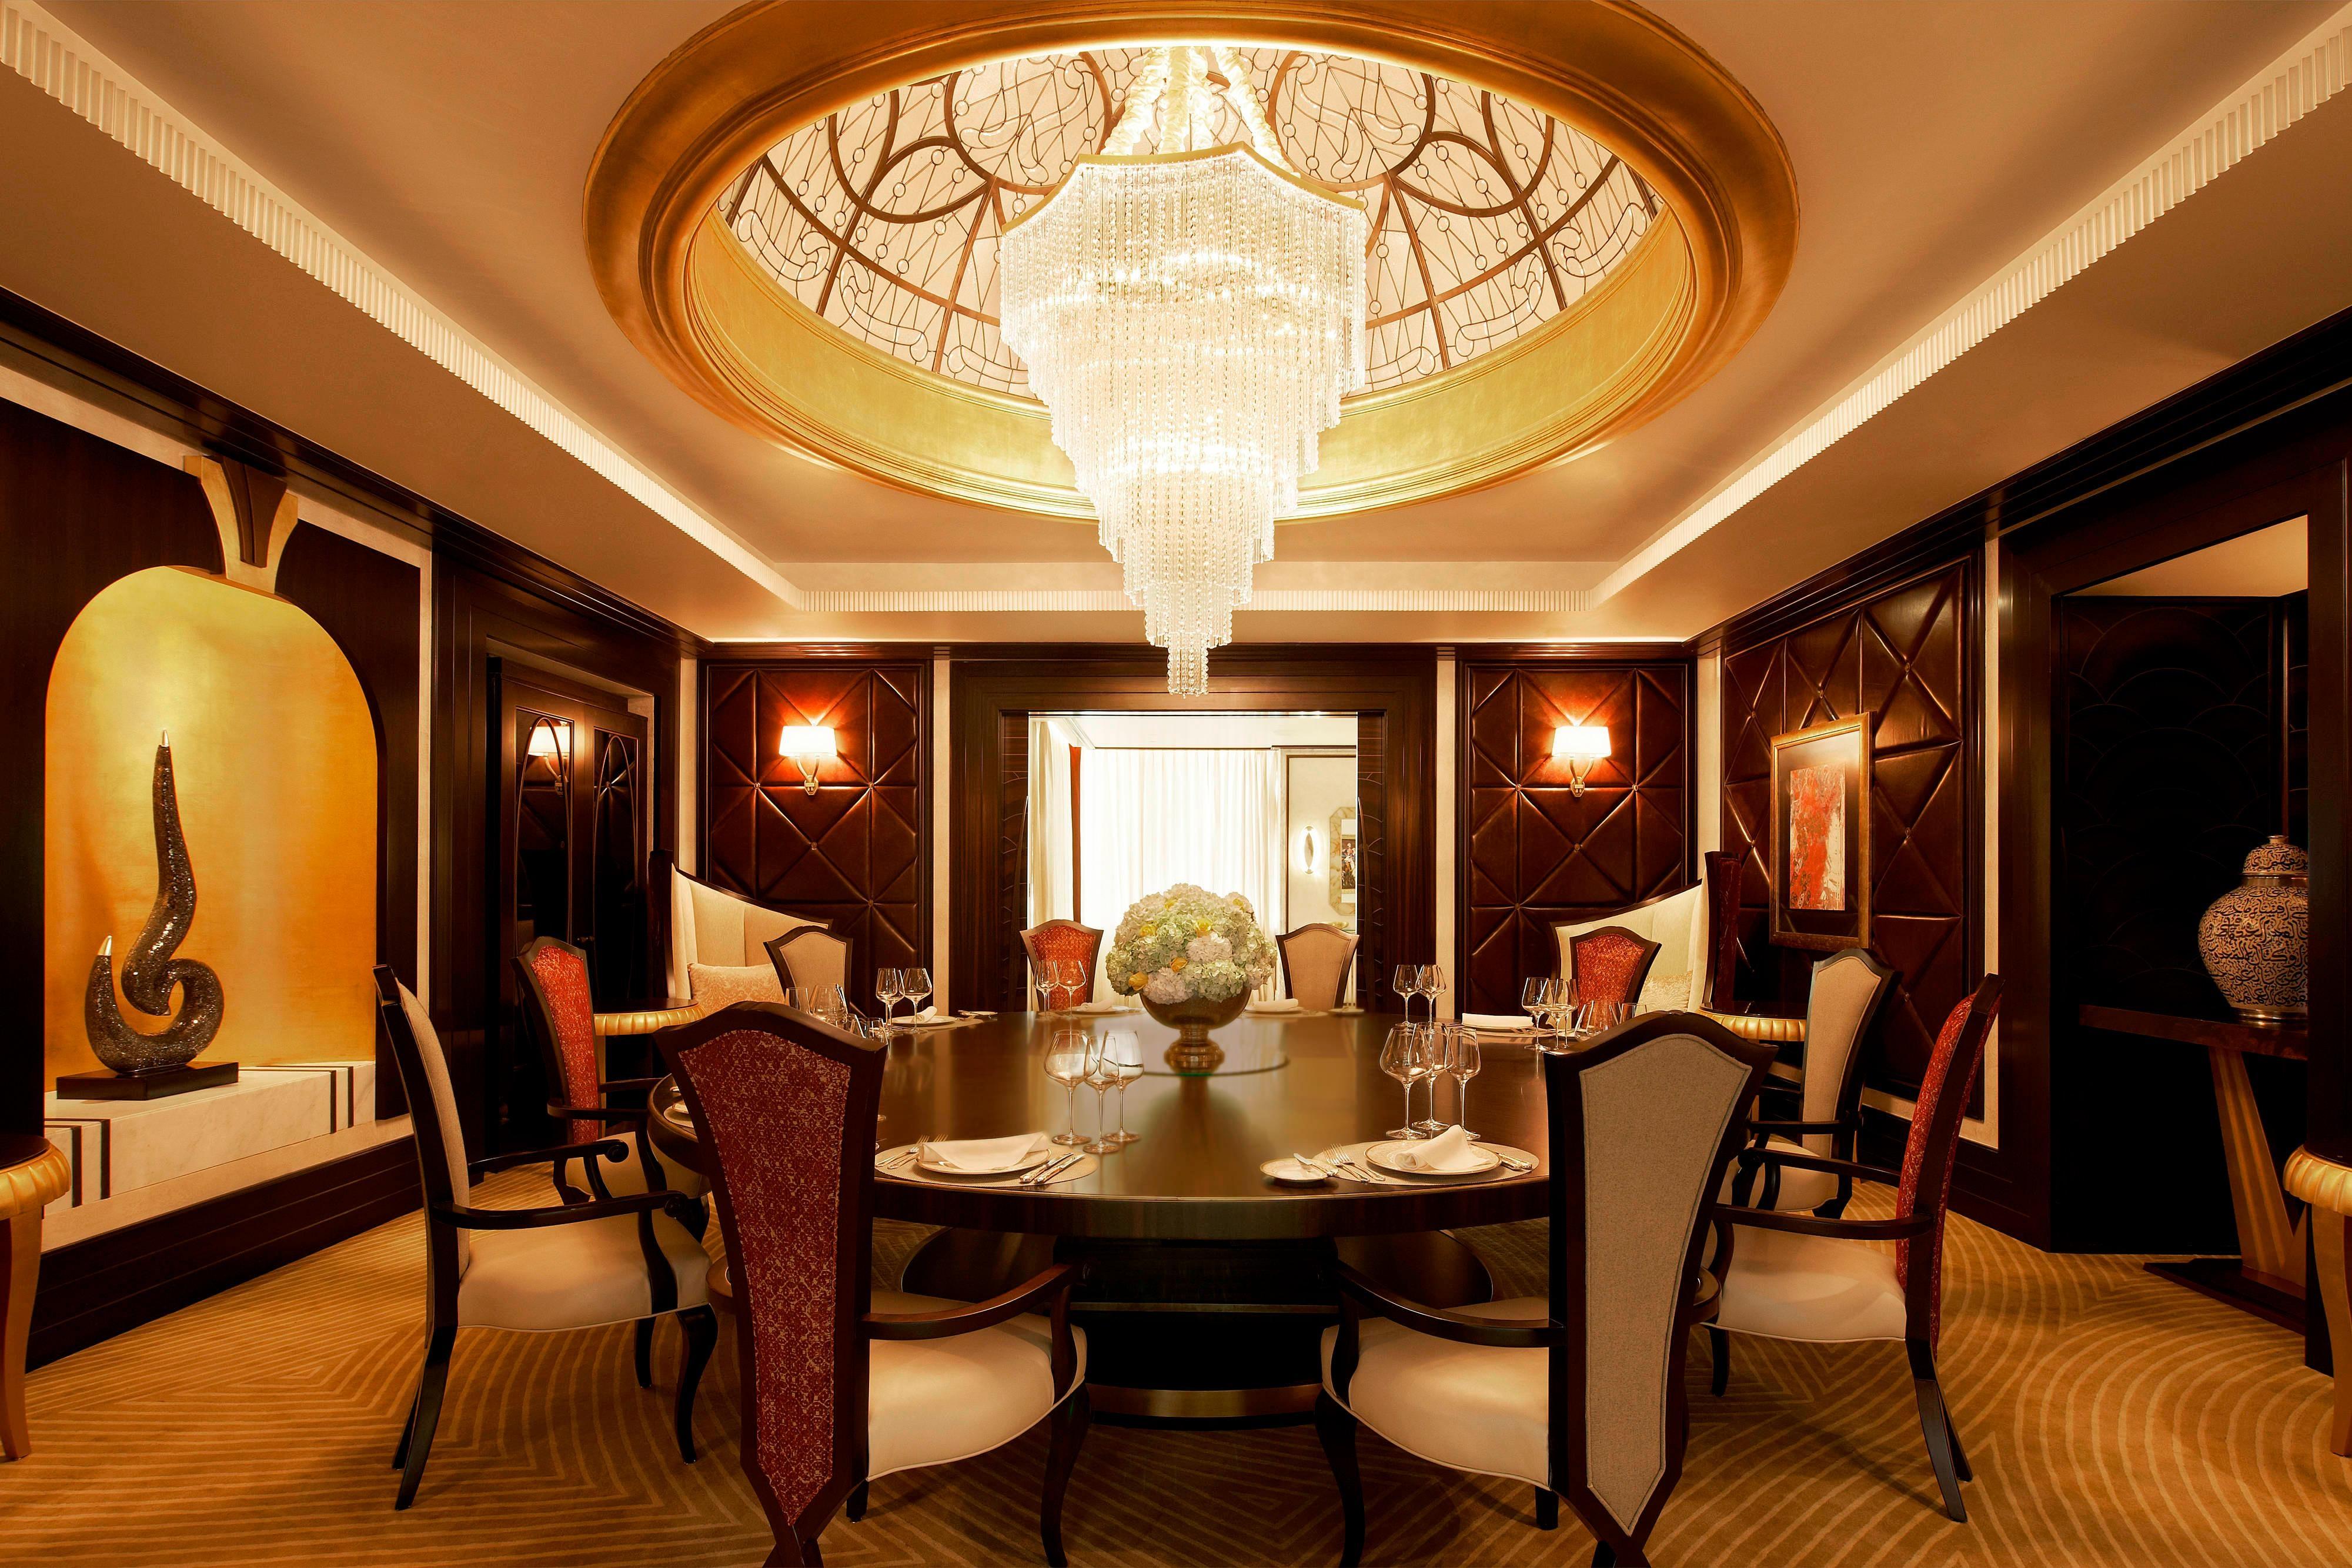 Abu Dhabi Suite - Dining Room